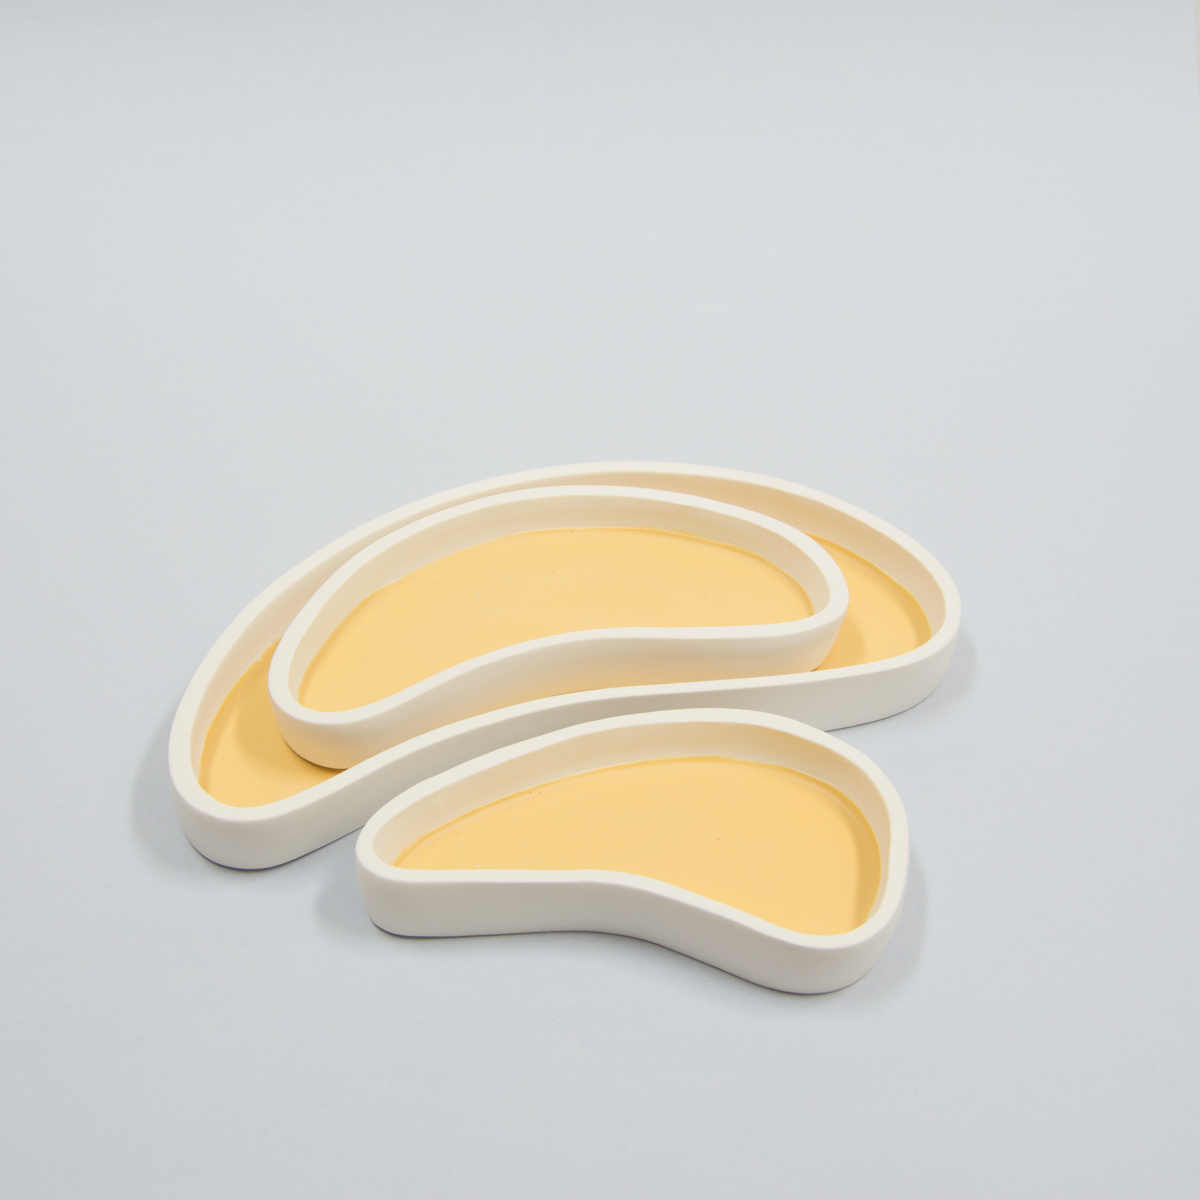 Set de 3 plats formes jaune ocre